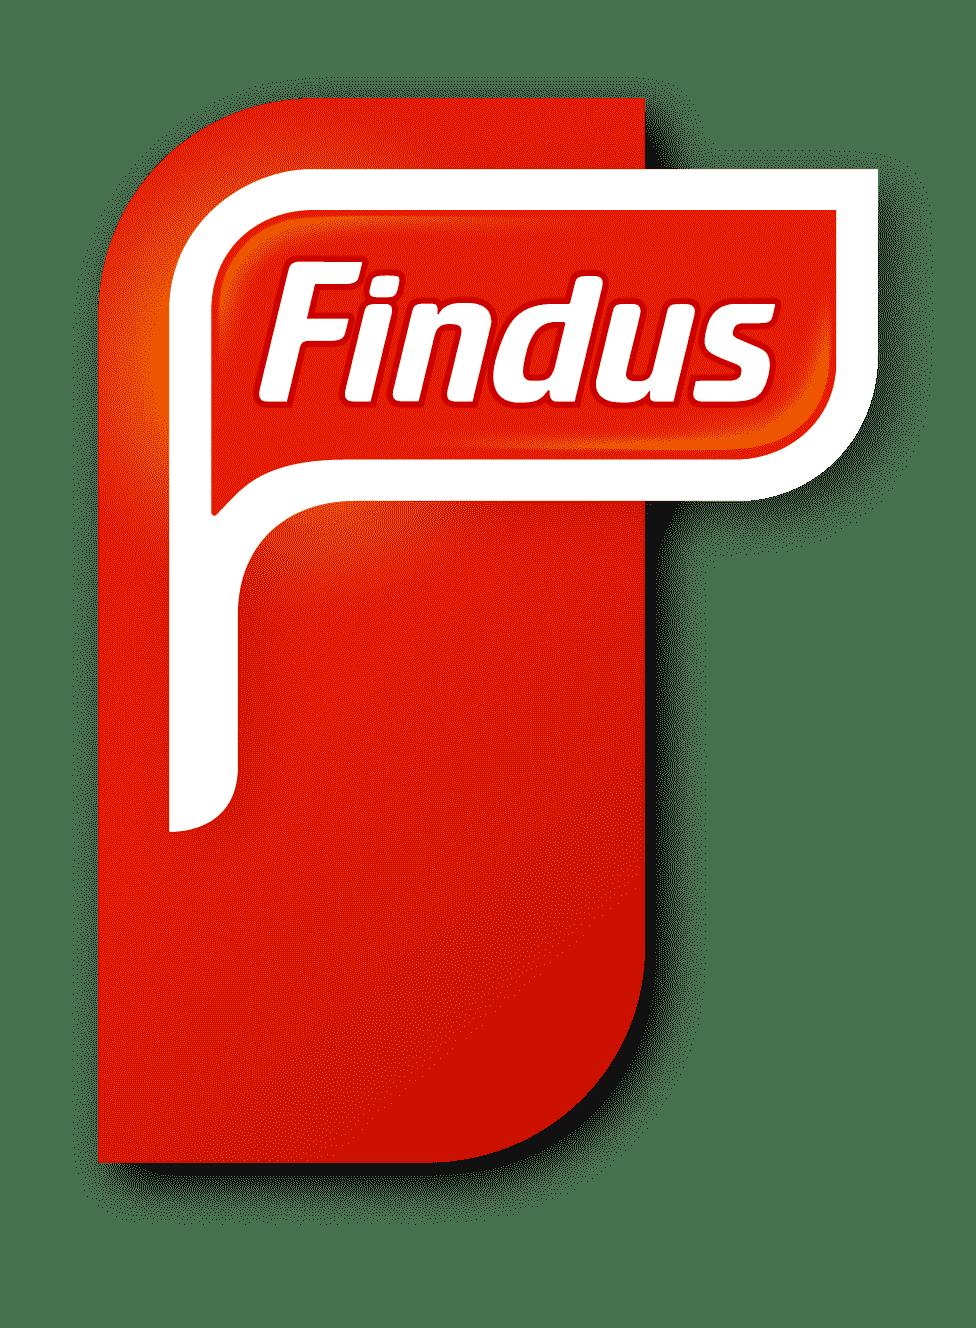 findus_logo primr.PNG